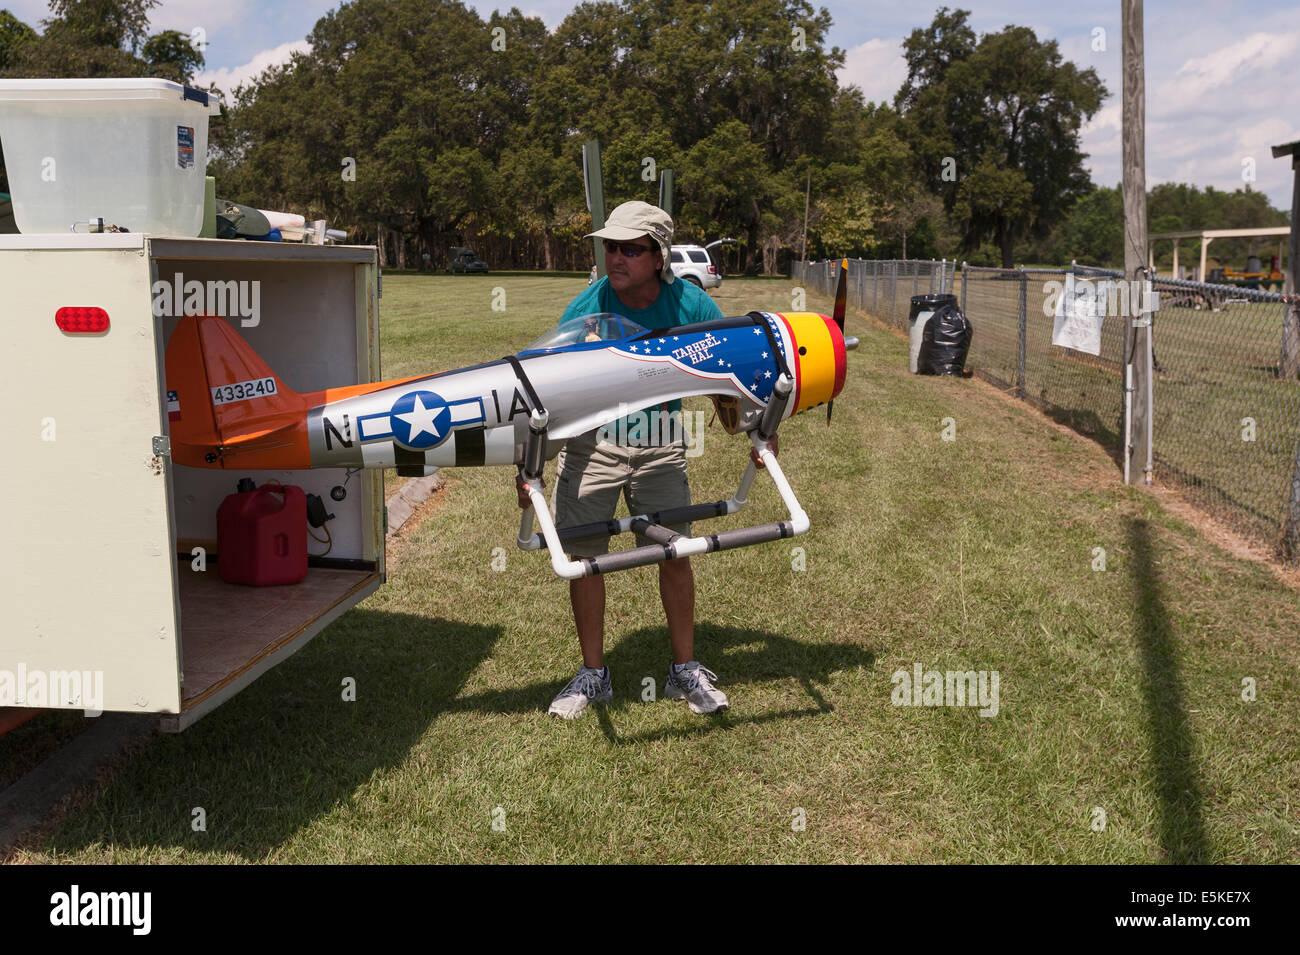 Rc Airplane Hobbyist Remote Stock Photos & Rc Airplane